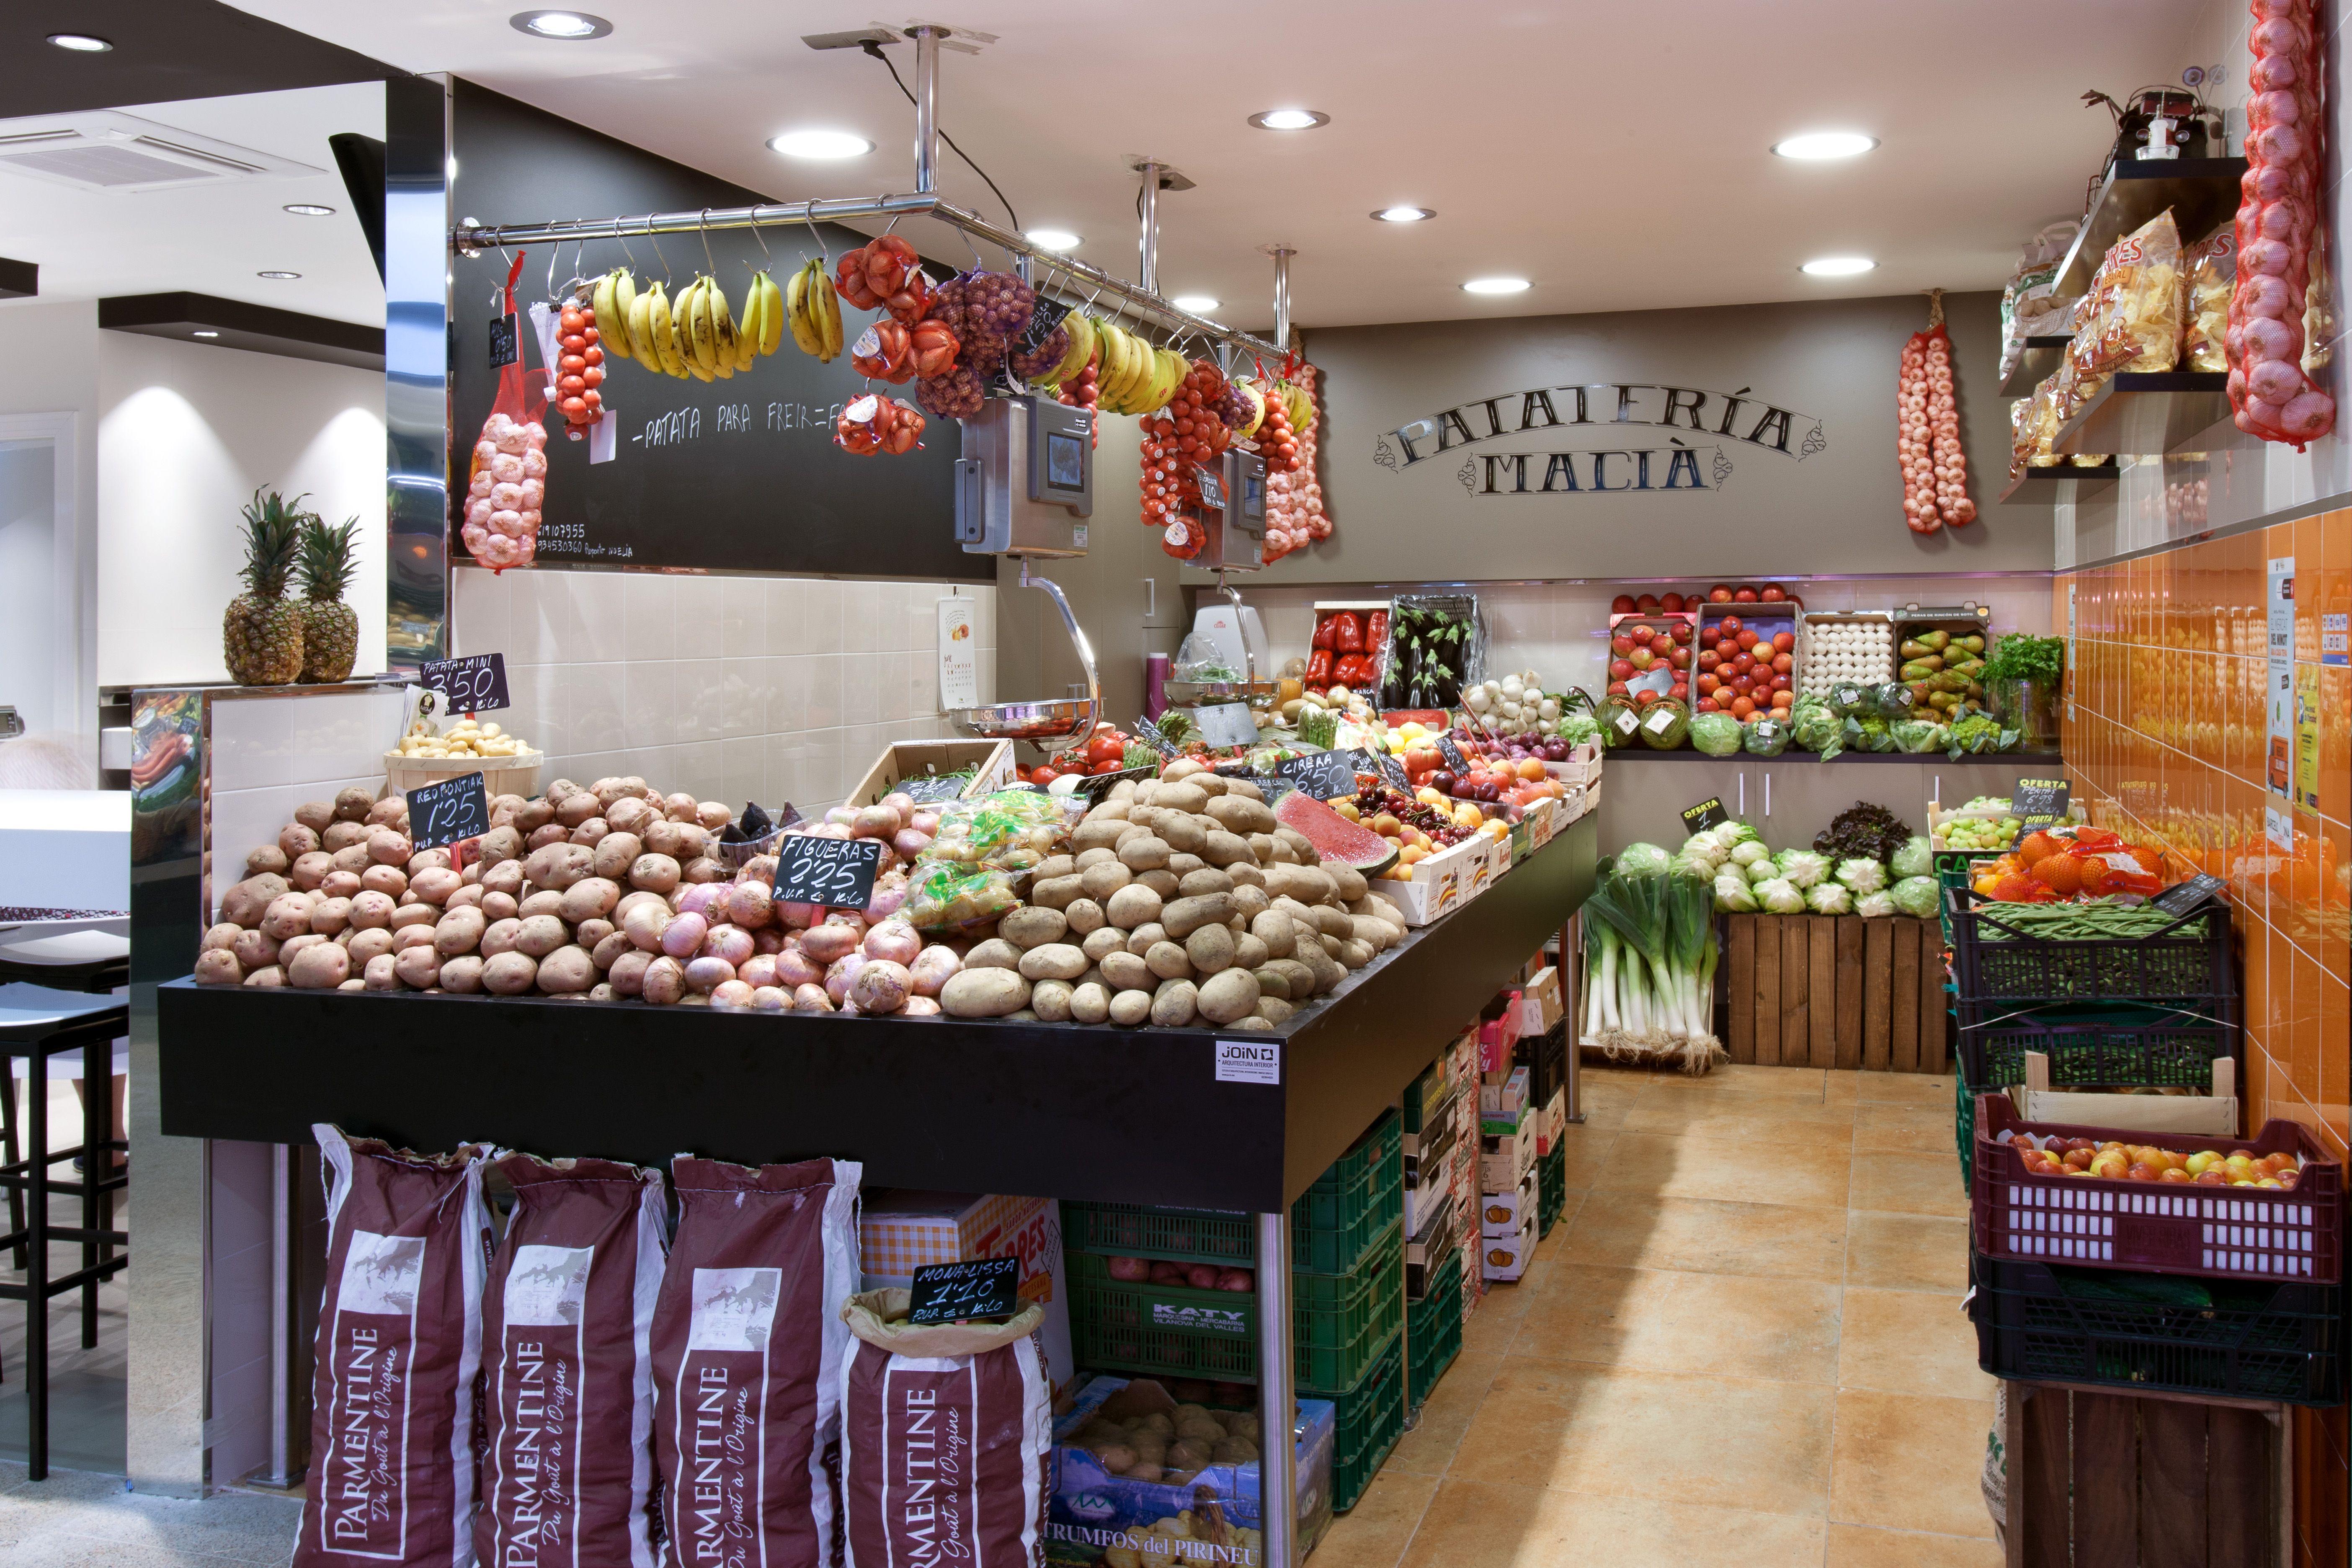 Paradas de mercado - Small store - potatoes shop - food markets ...